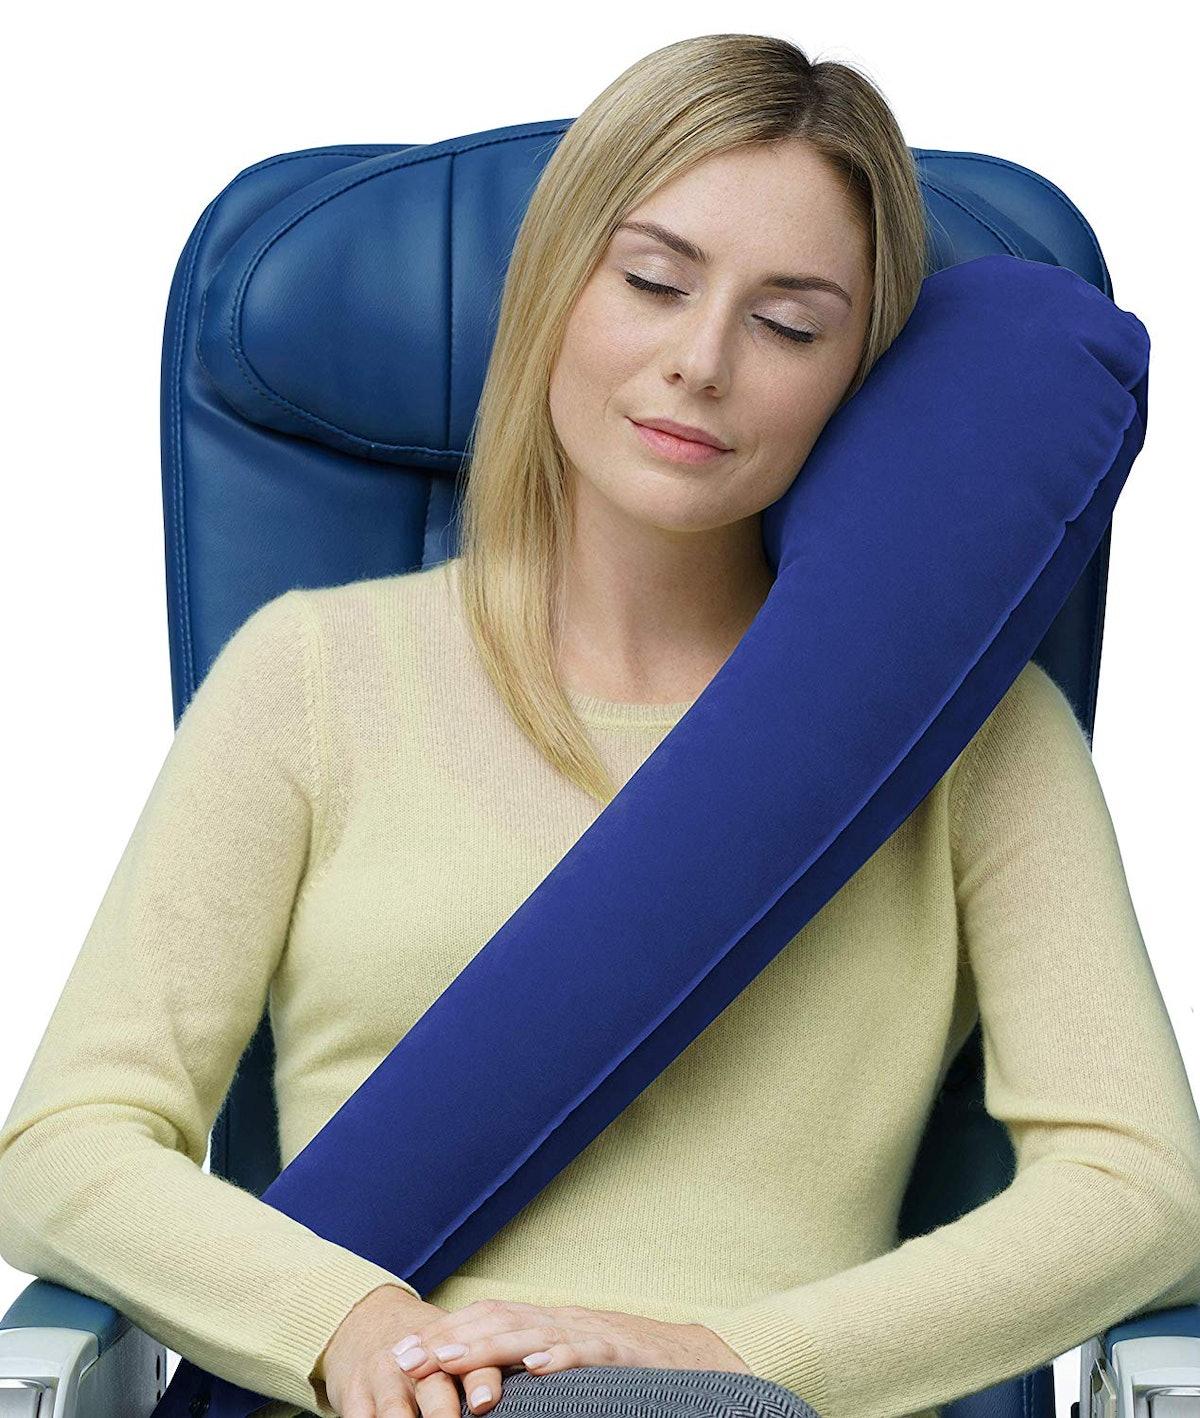 Travelrest Inflatable Travel Pillow